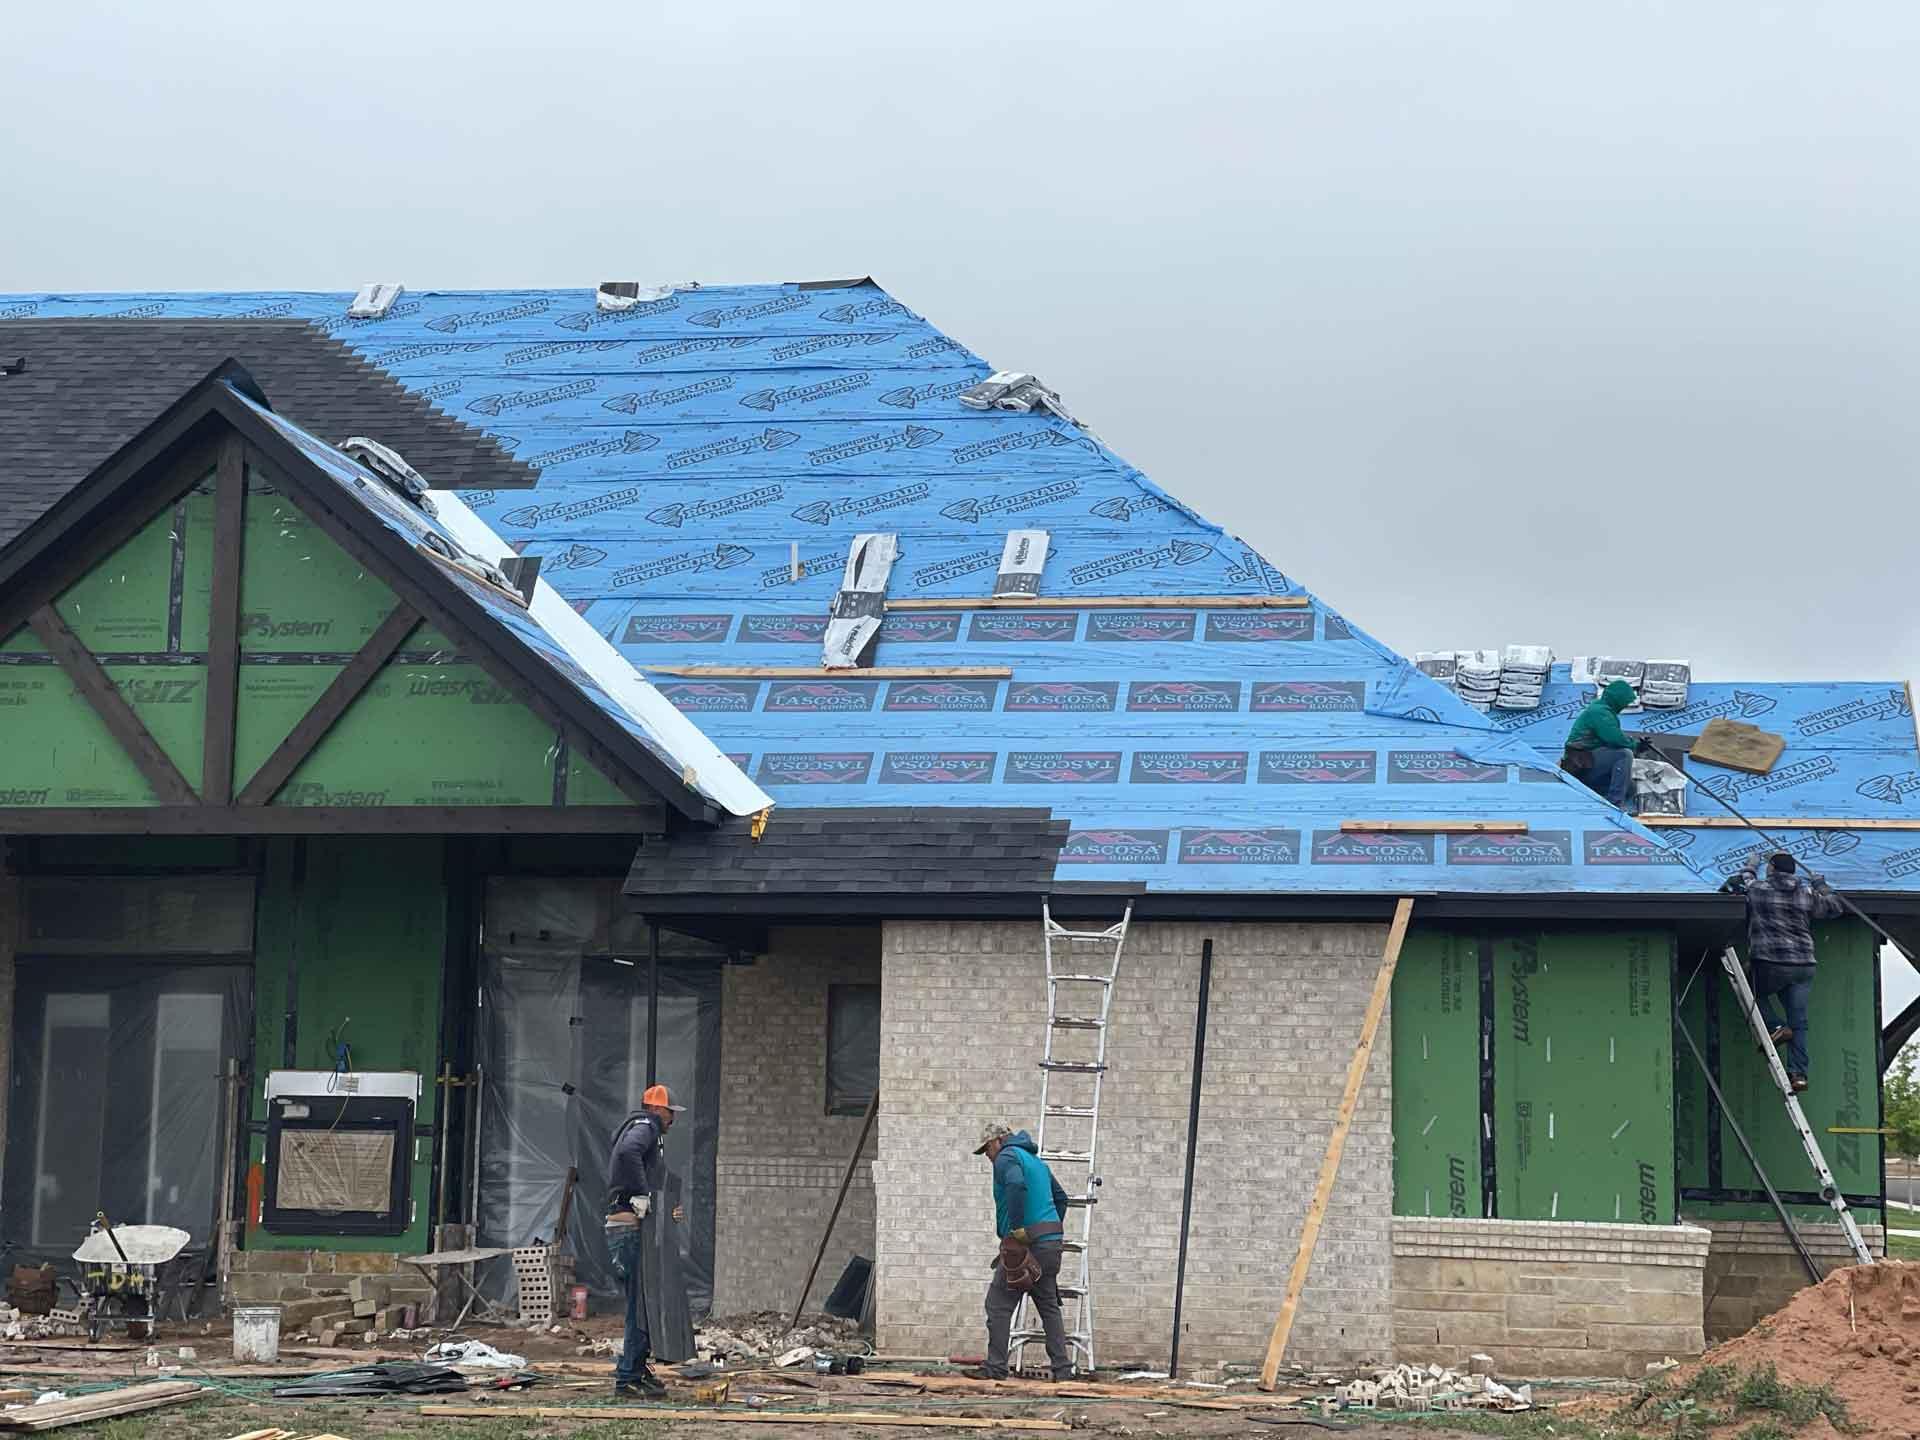 tascosa-roofing-23